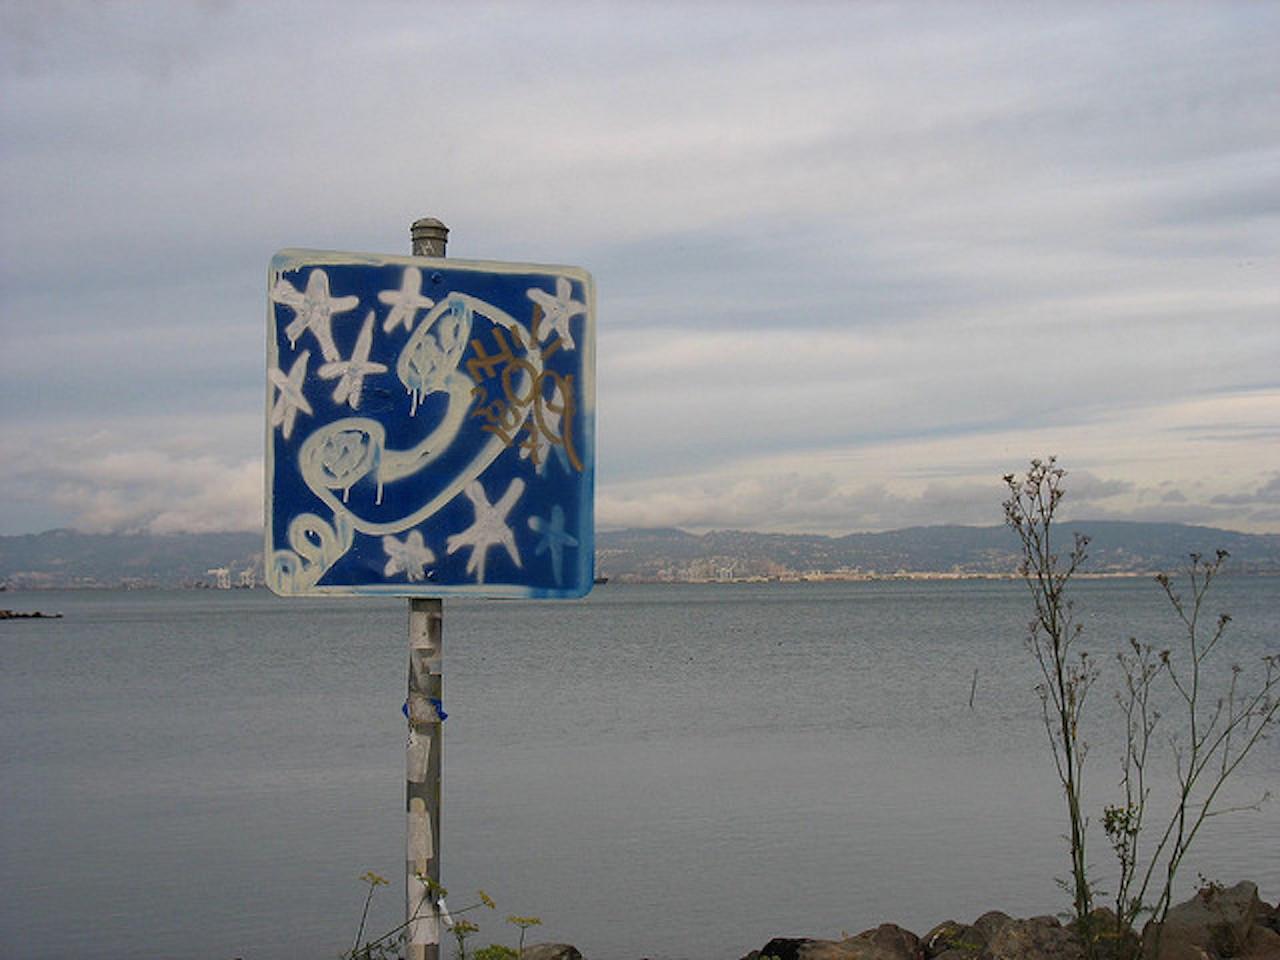 Graffiti art in Warm Water Cove Park | © Orin Zebest/Flickr